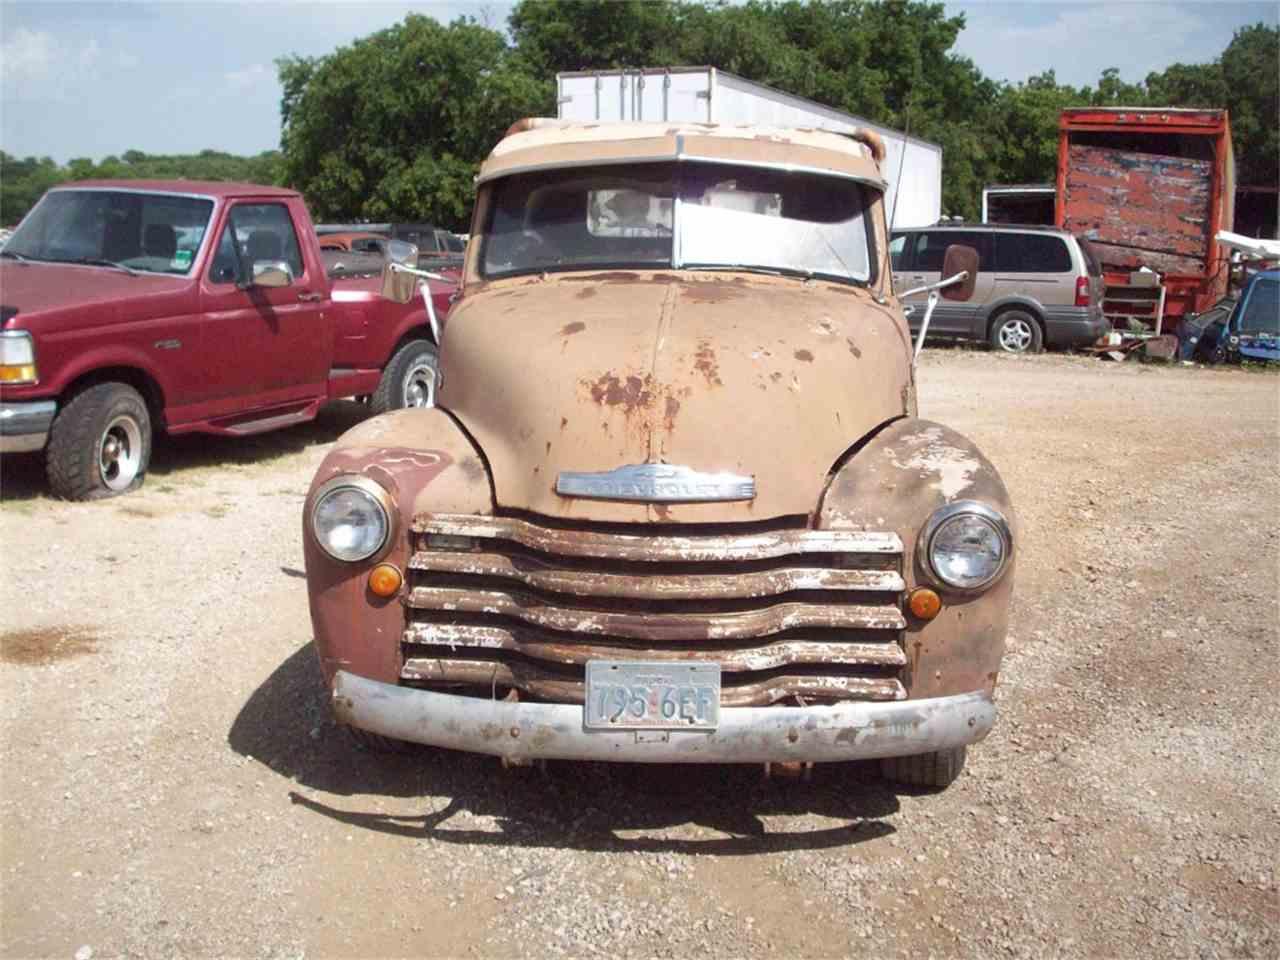 1953 Chevrolet 3/4-Ton Pickup for Sale | ClassicCars.com | CC-1112267